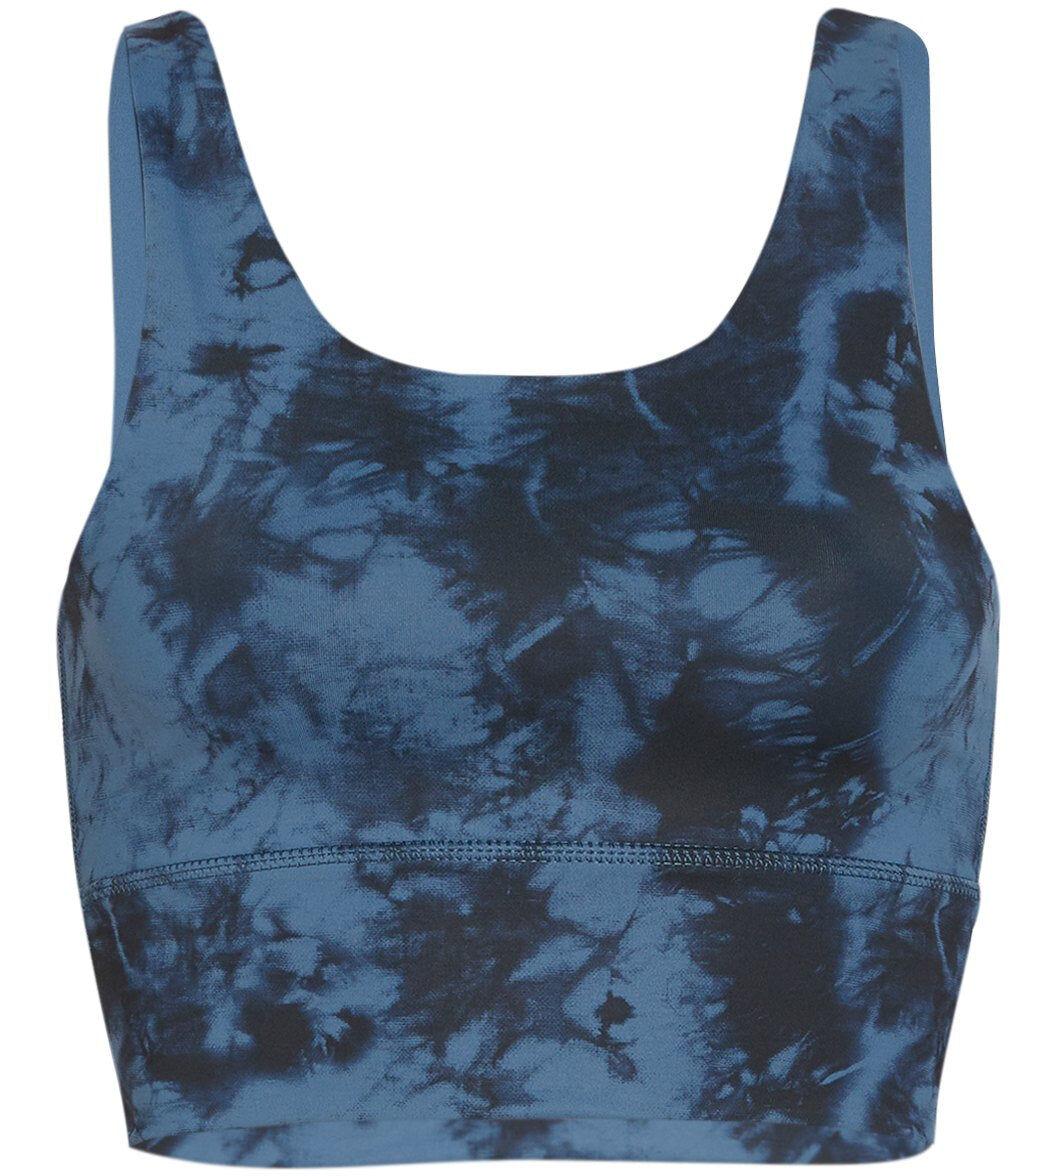 DYI Women's Elevate Printed Yoga Sports Bra - Chambray Tie Dye X-Small Spandex